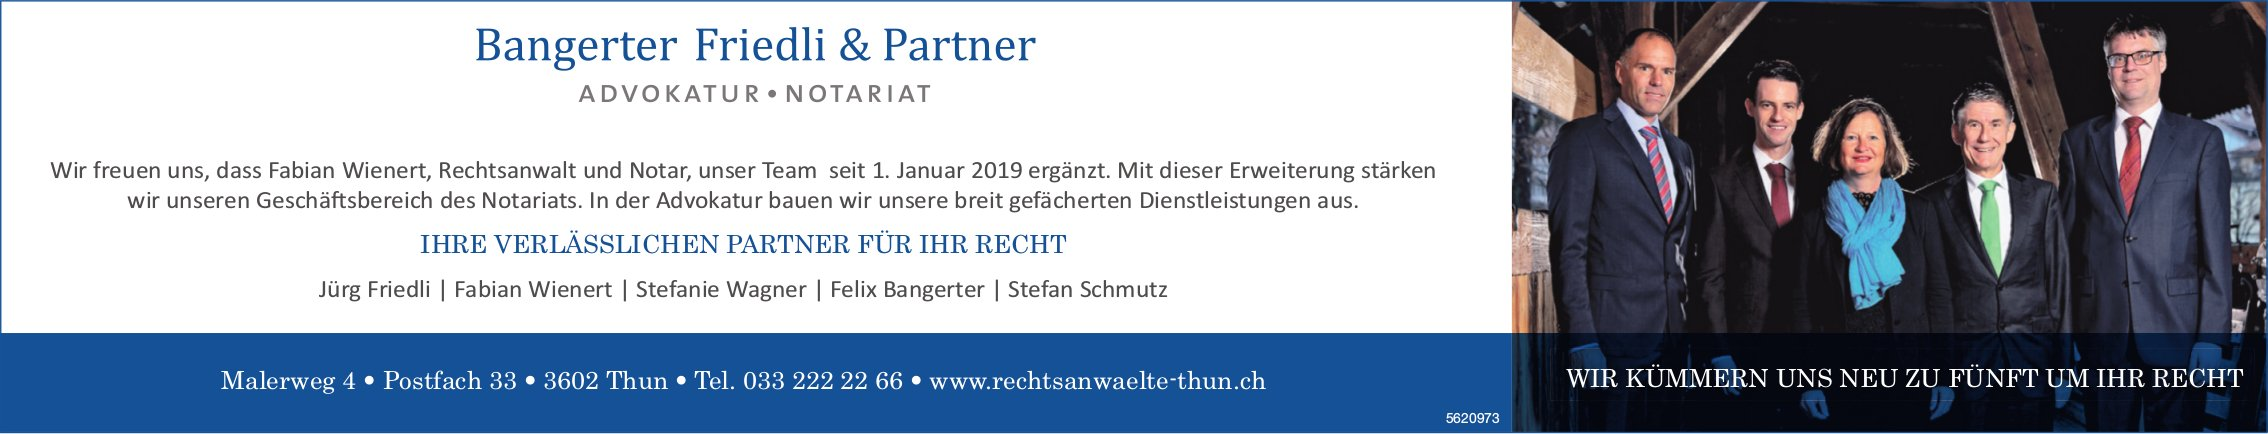 ADVOKATUR NOTARIAT, Bangerter Friedli & Partner, Thun